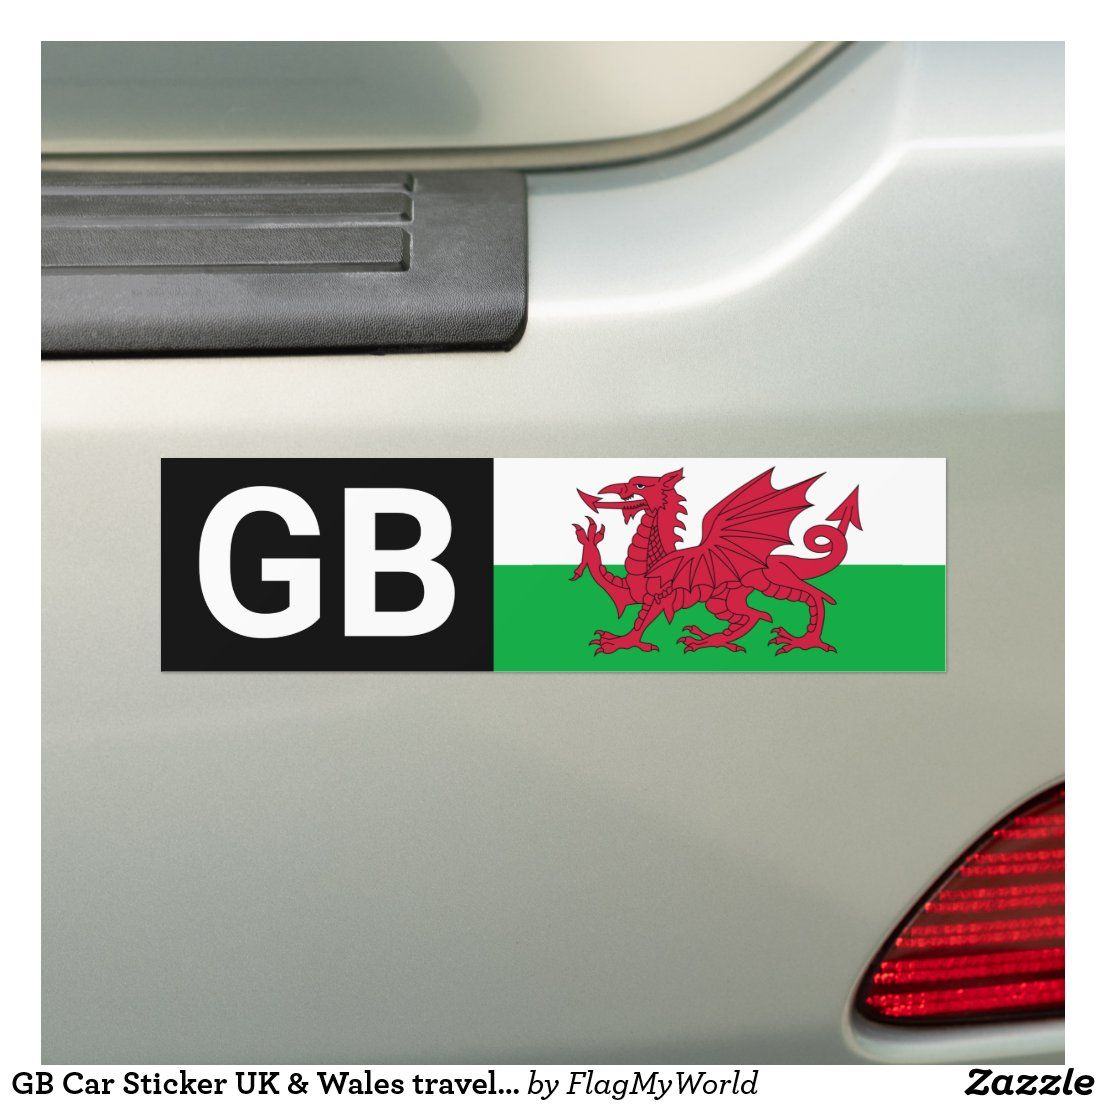 Gb Car Sticker Uk Wales Travel Abroad Welsh Flag Zazzle Com Wales Travel Welsh Flag Travel Abroad [ 1106 x 1106 Pixel ]